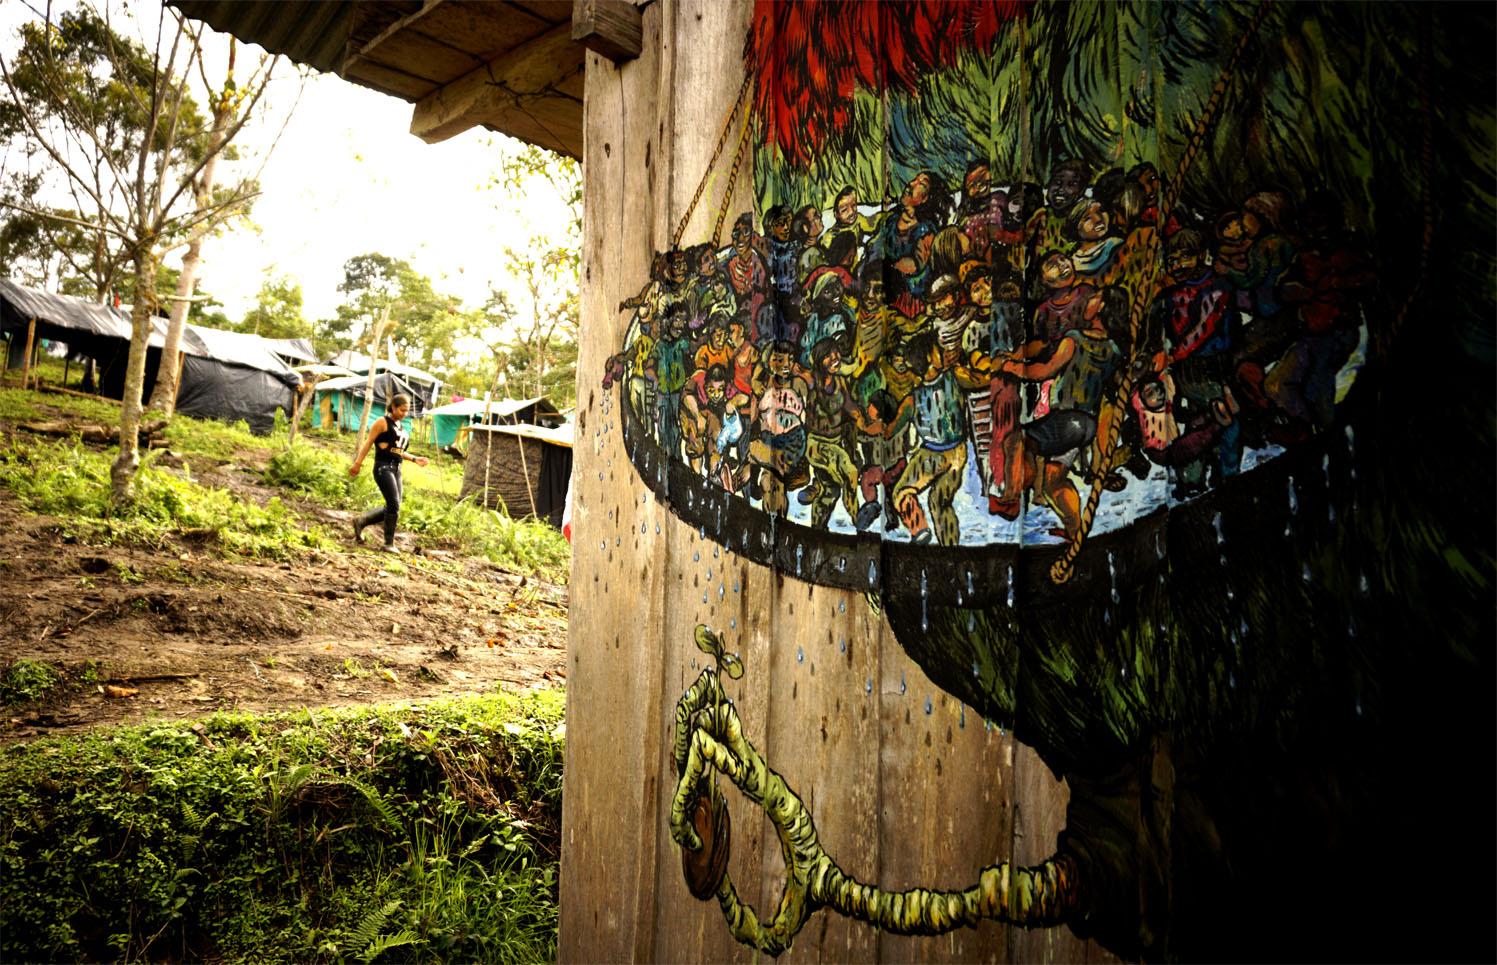 Ericailcane Bastardilla Zona Veredal de Paz, Icononzo, Colombia